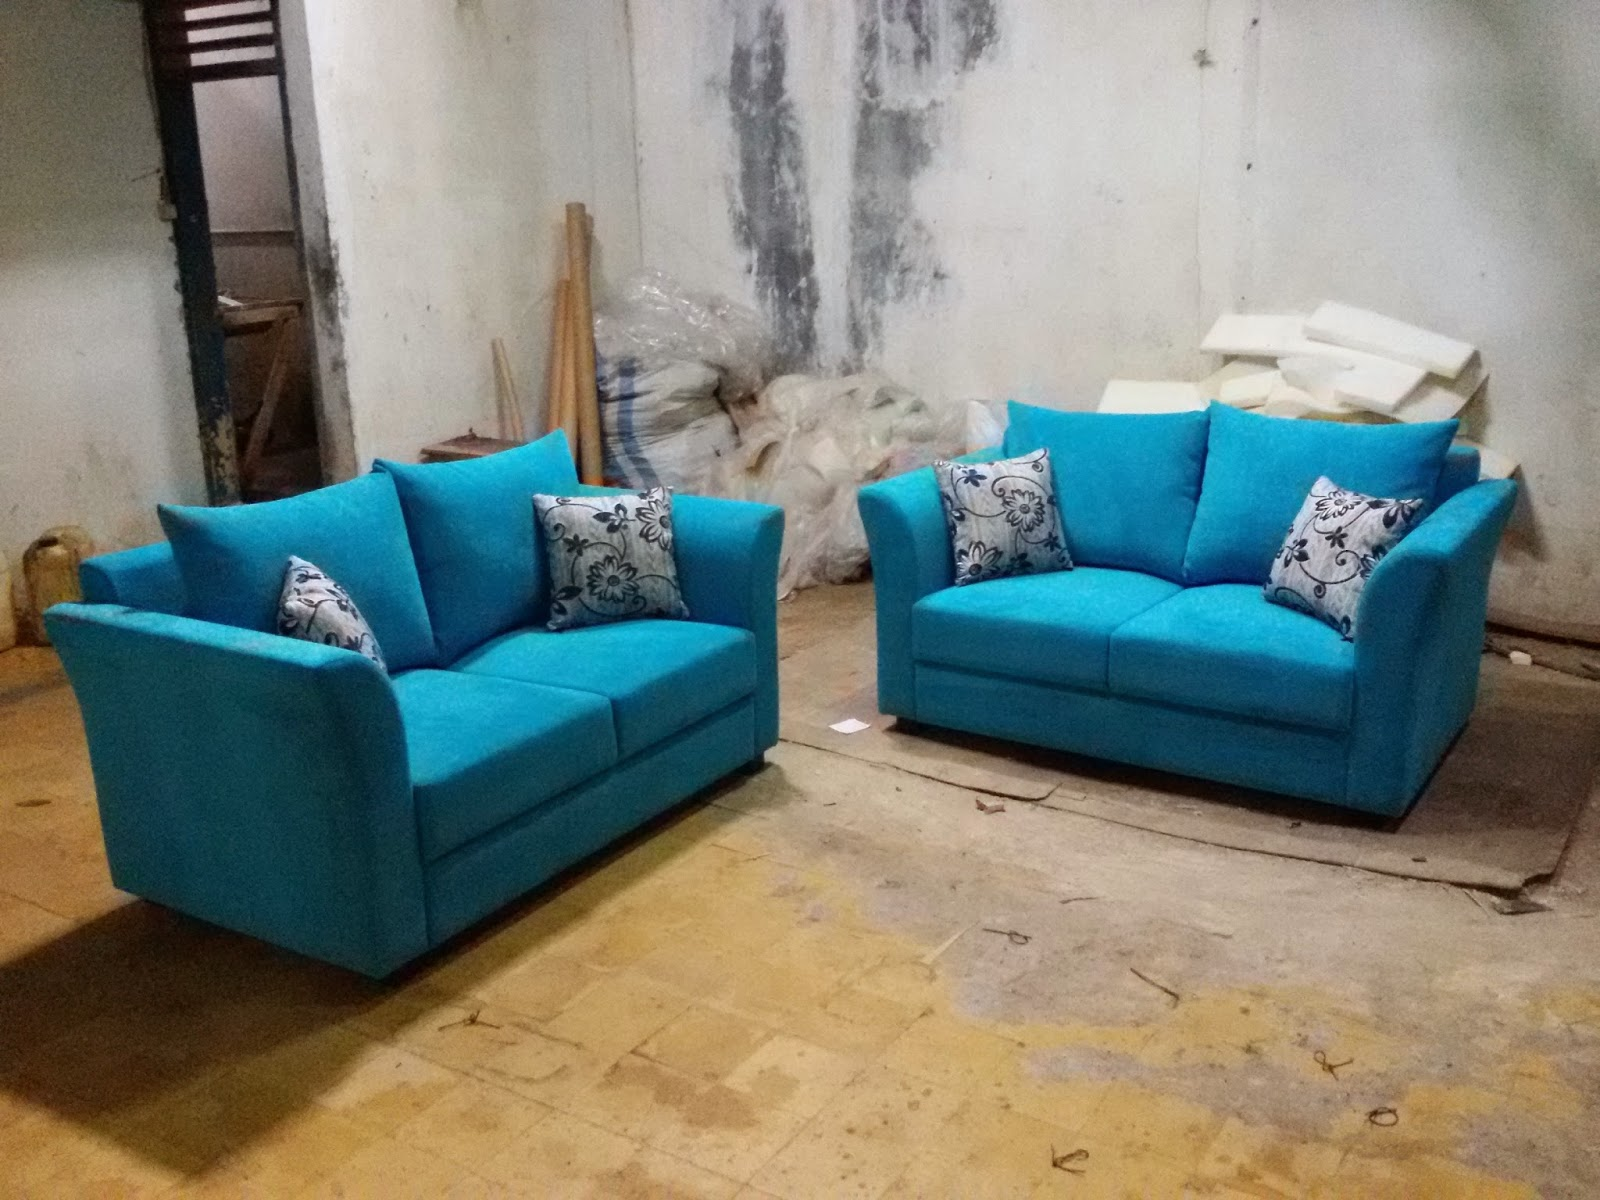 Jual Sofa Minimalis Murah Mewah Harga Pabrik 1 Jt An